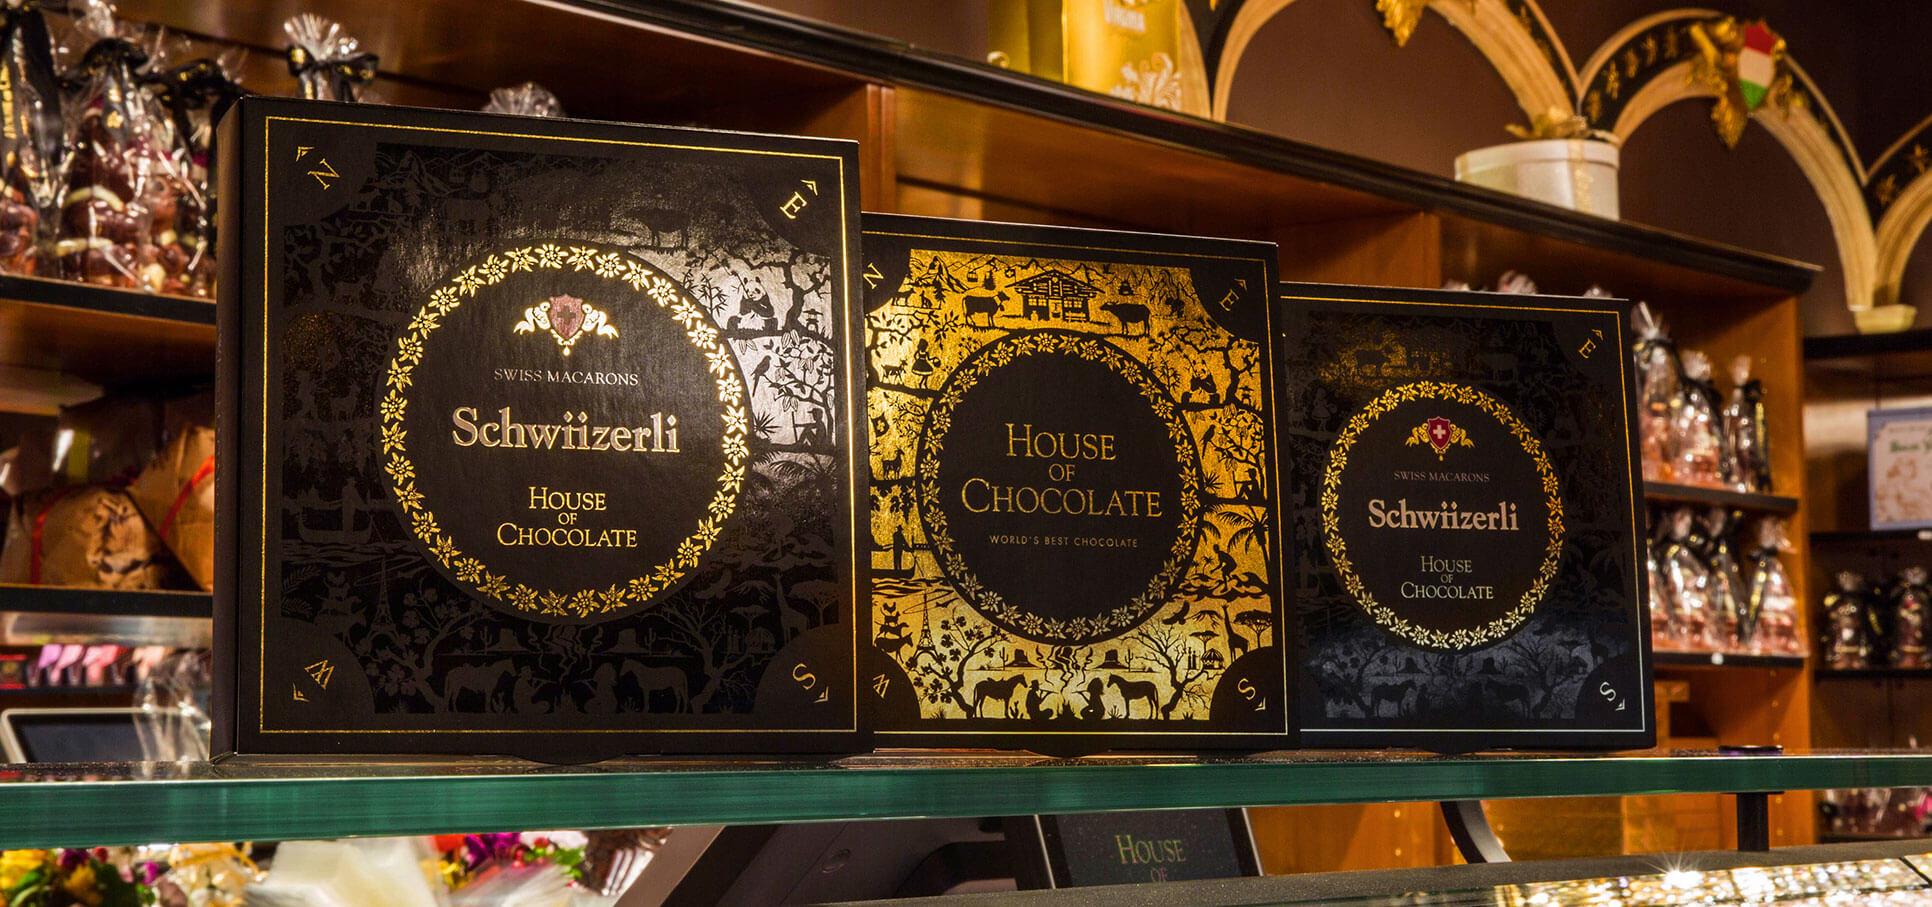 House-of-Chocolate-5-interieur-design-store-conzept-ladenbau-shop-ville-zuerich.jpg.jpg